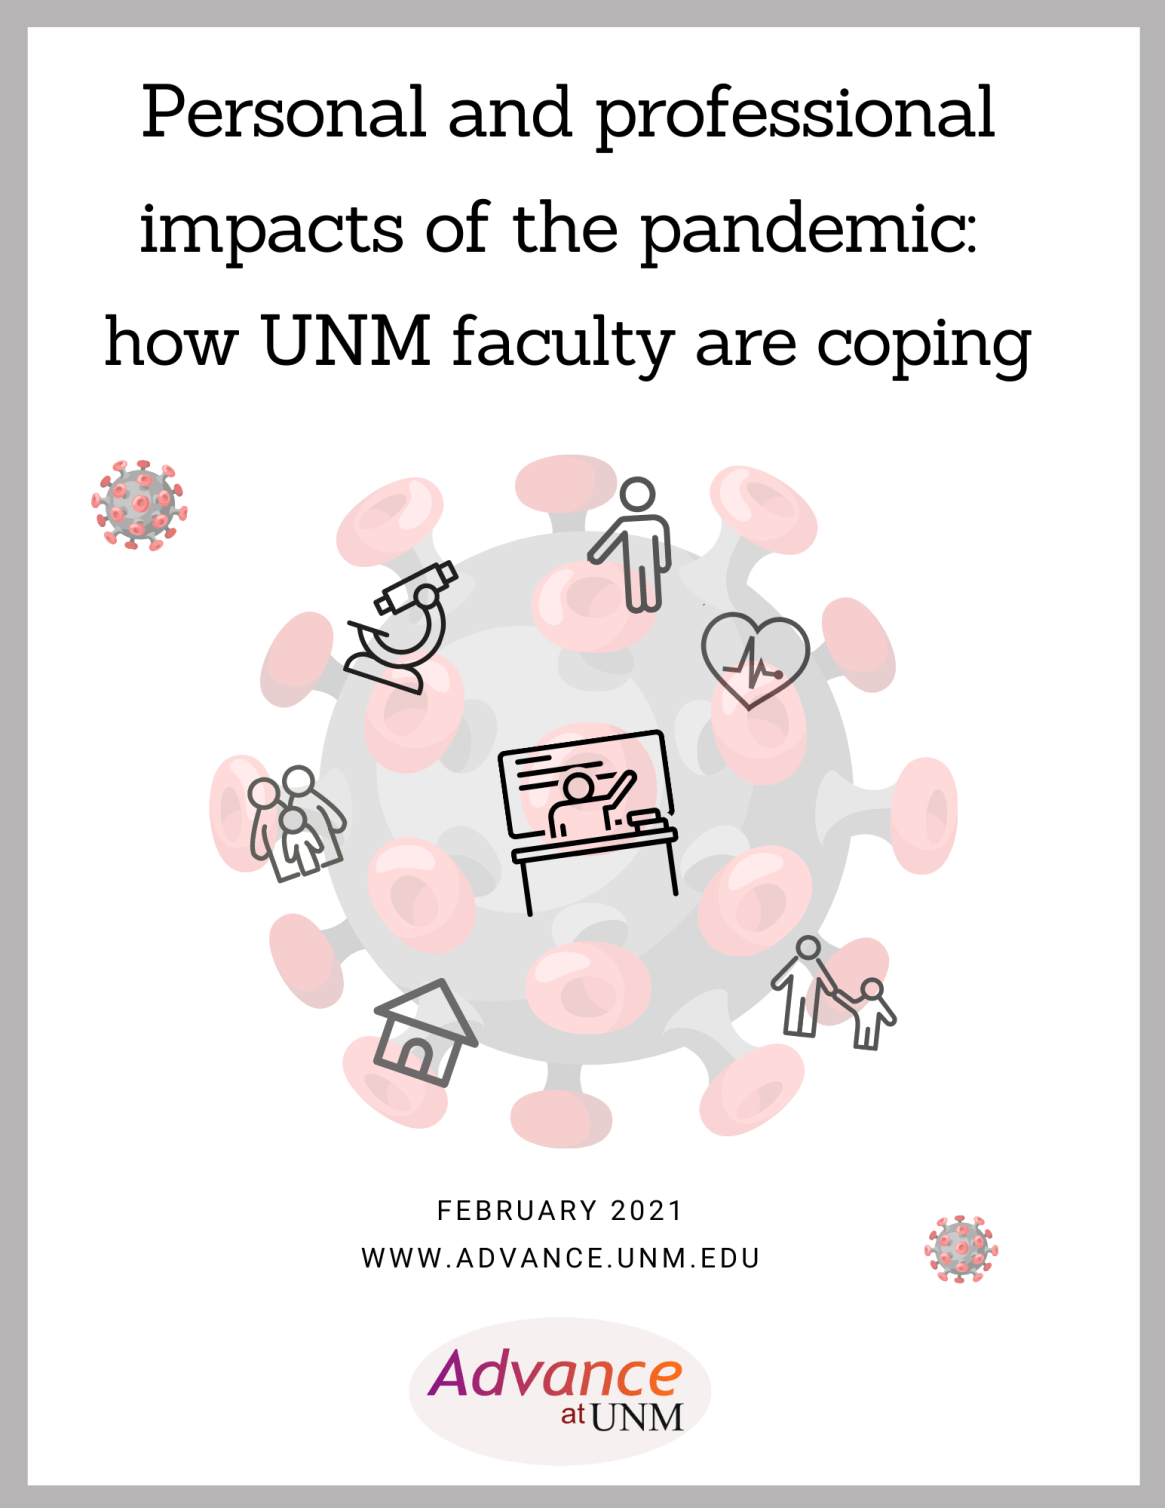 PandemicImpacts (3)